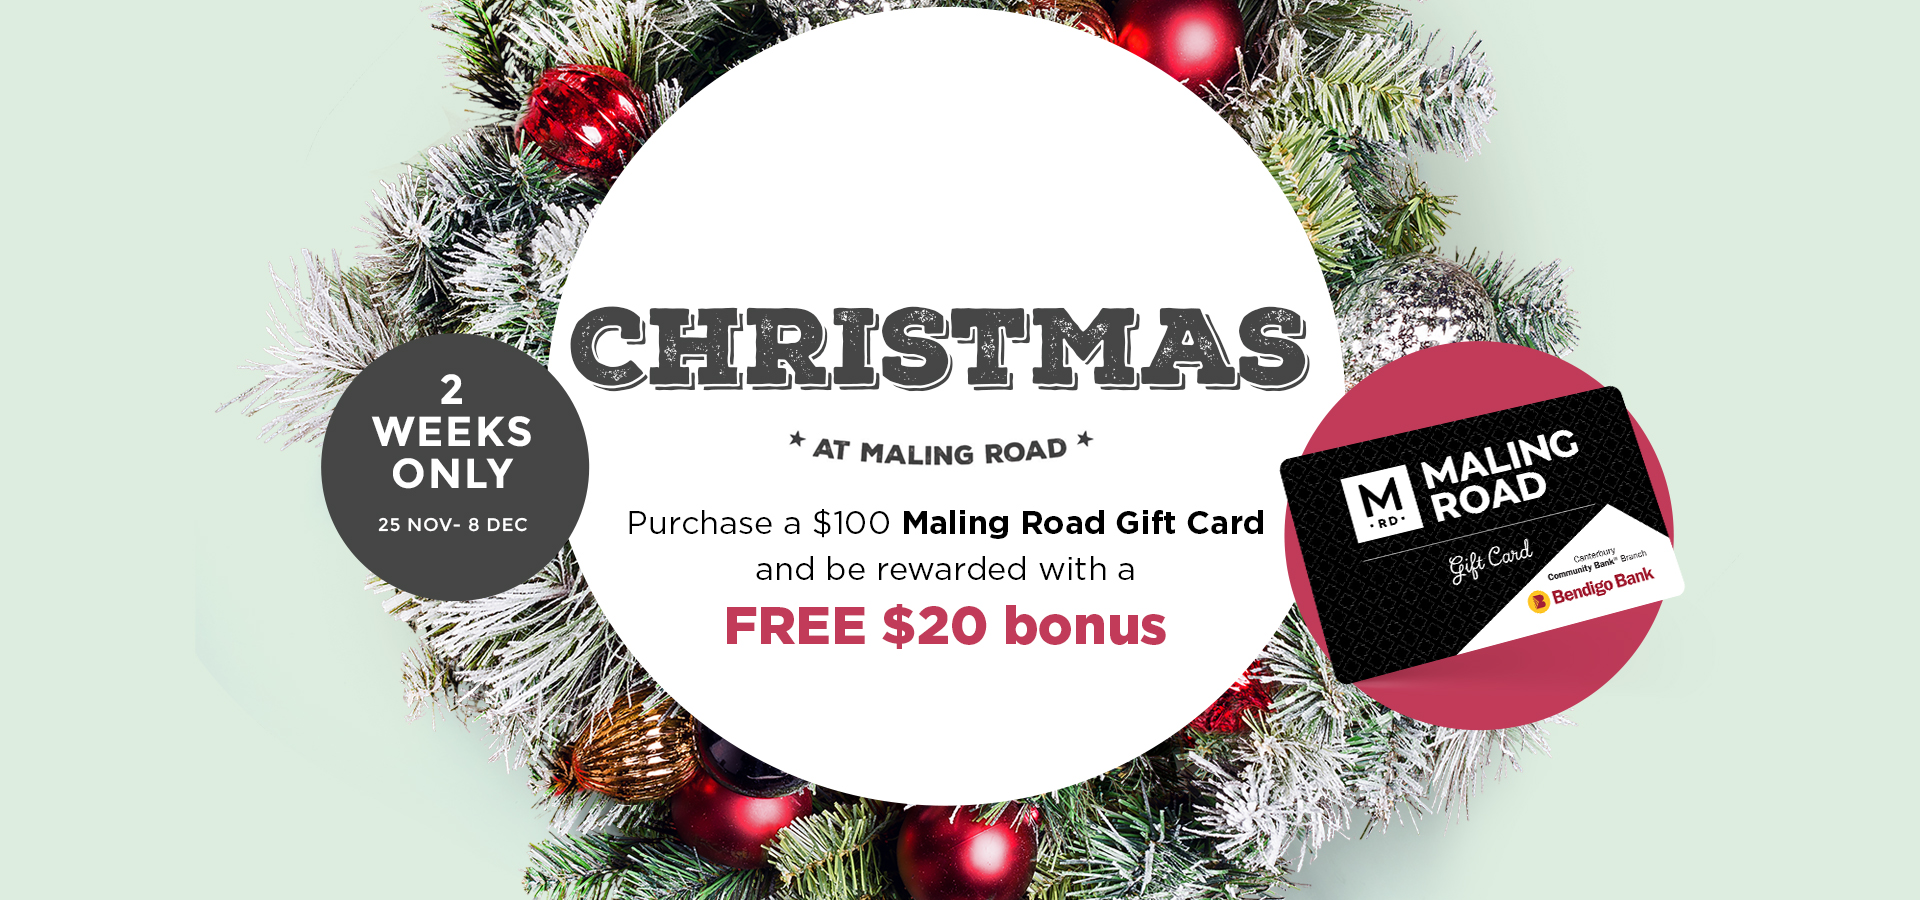 Maling-Road-Christmas-Gift-Card-Home-Banner